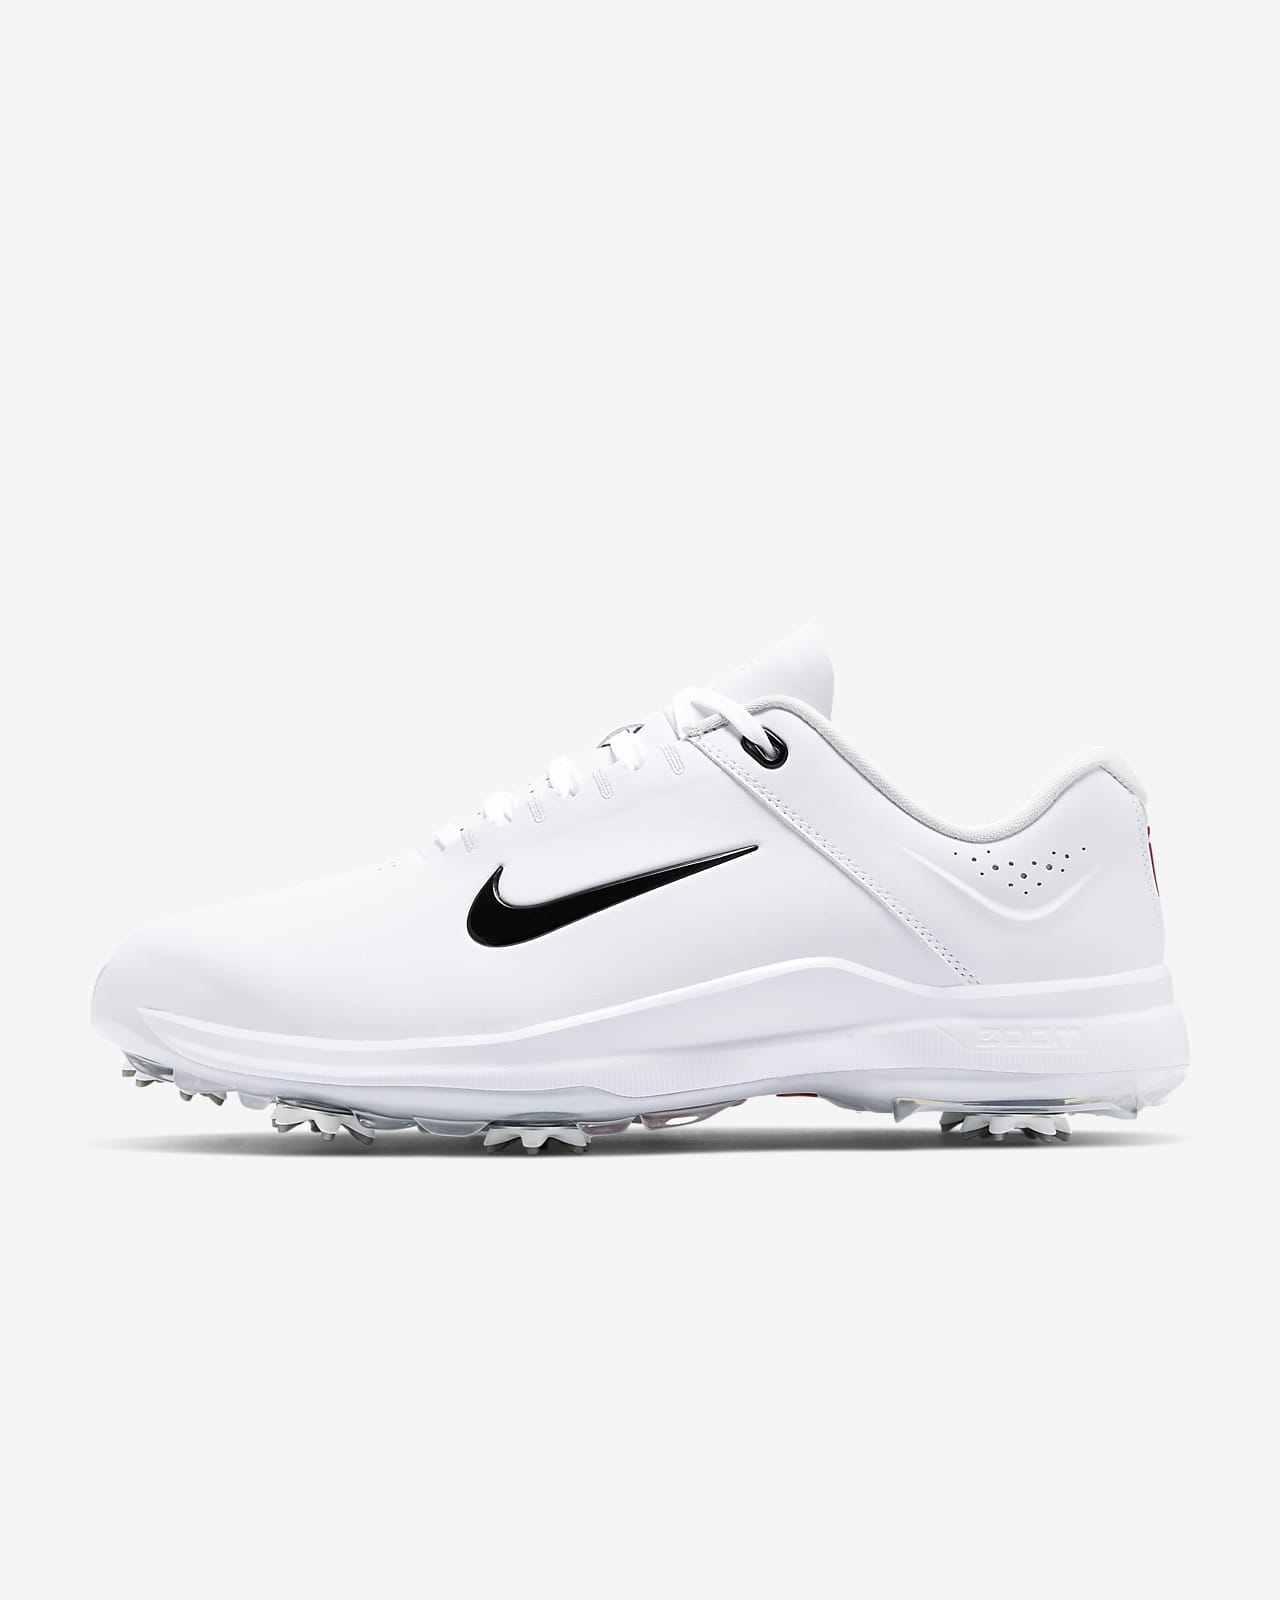 tiger golf shoes cheap online